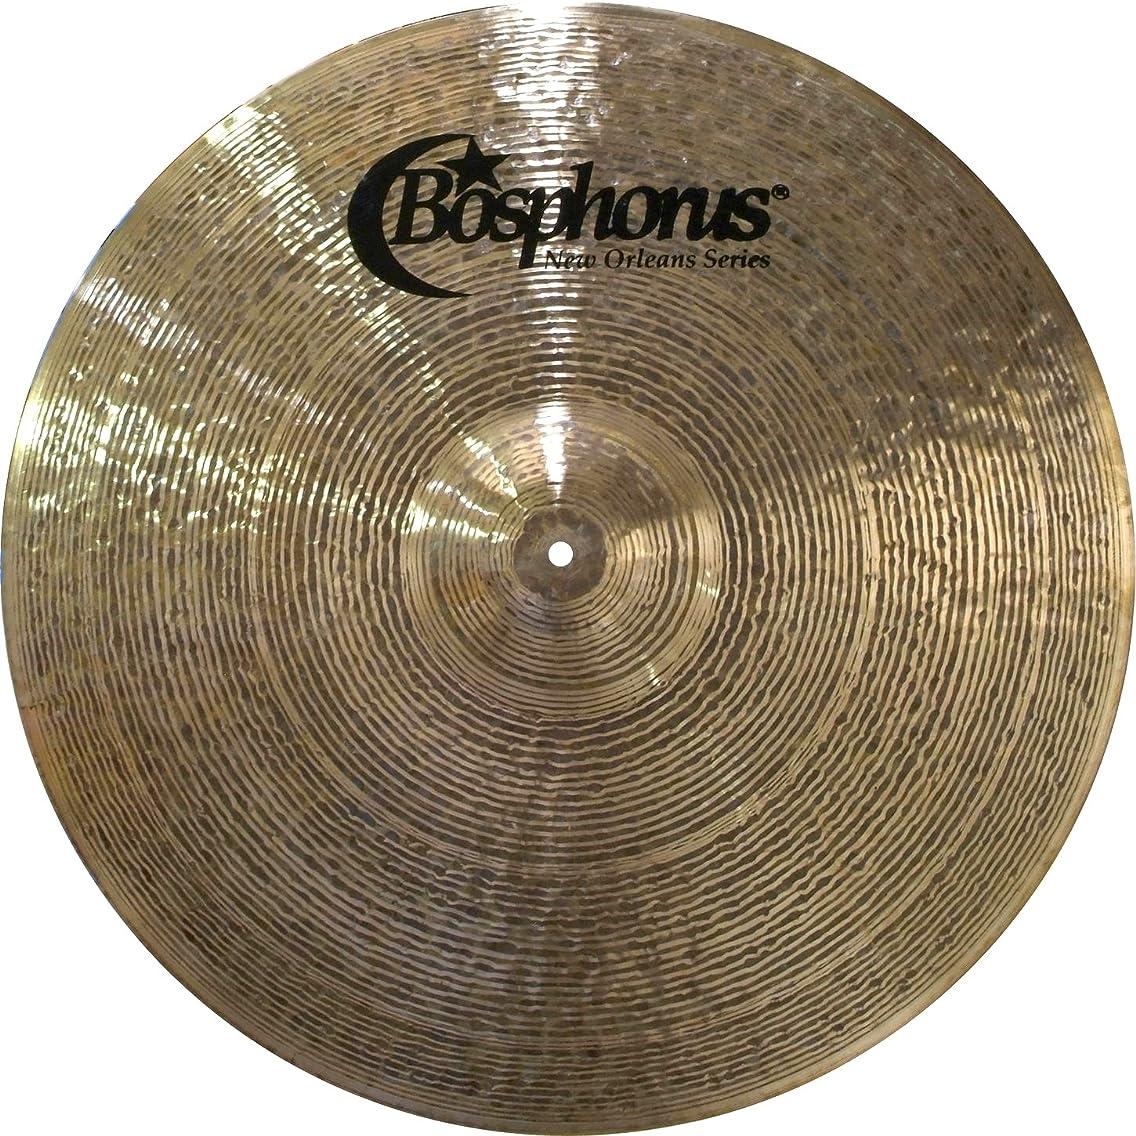 Bosphorus Cymbals N22R 22-Inch New Orleans Series Ride Cymbal